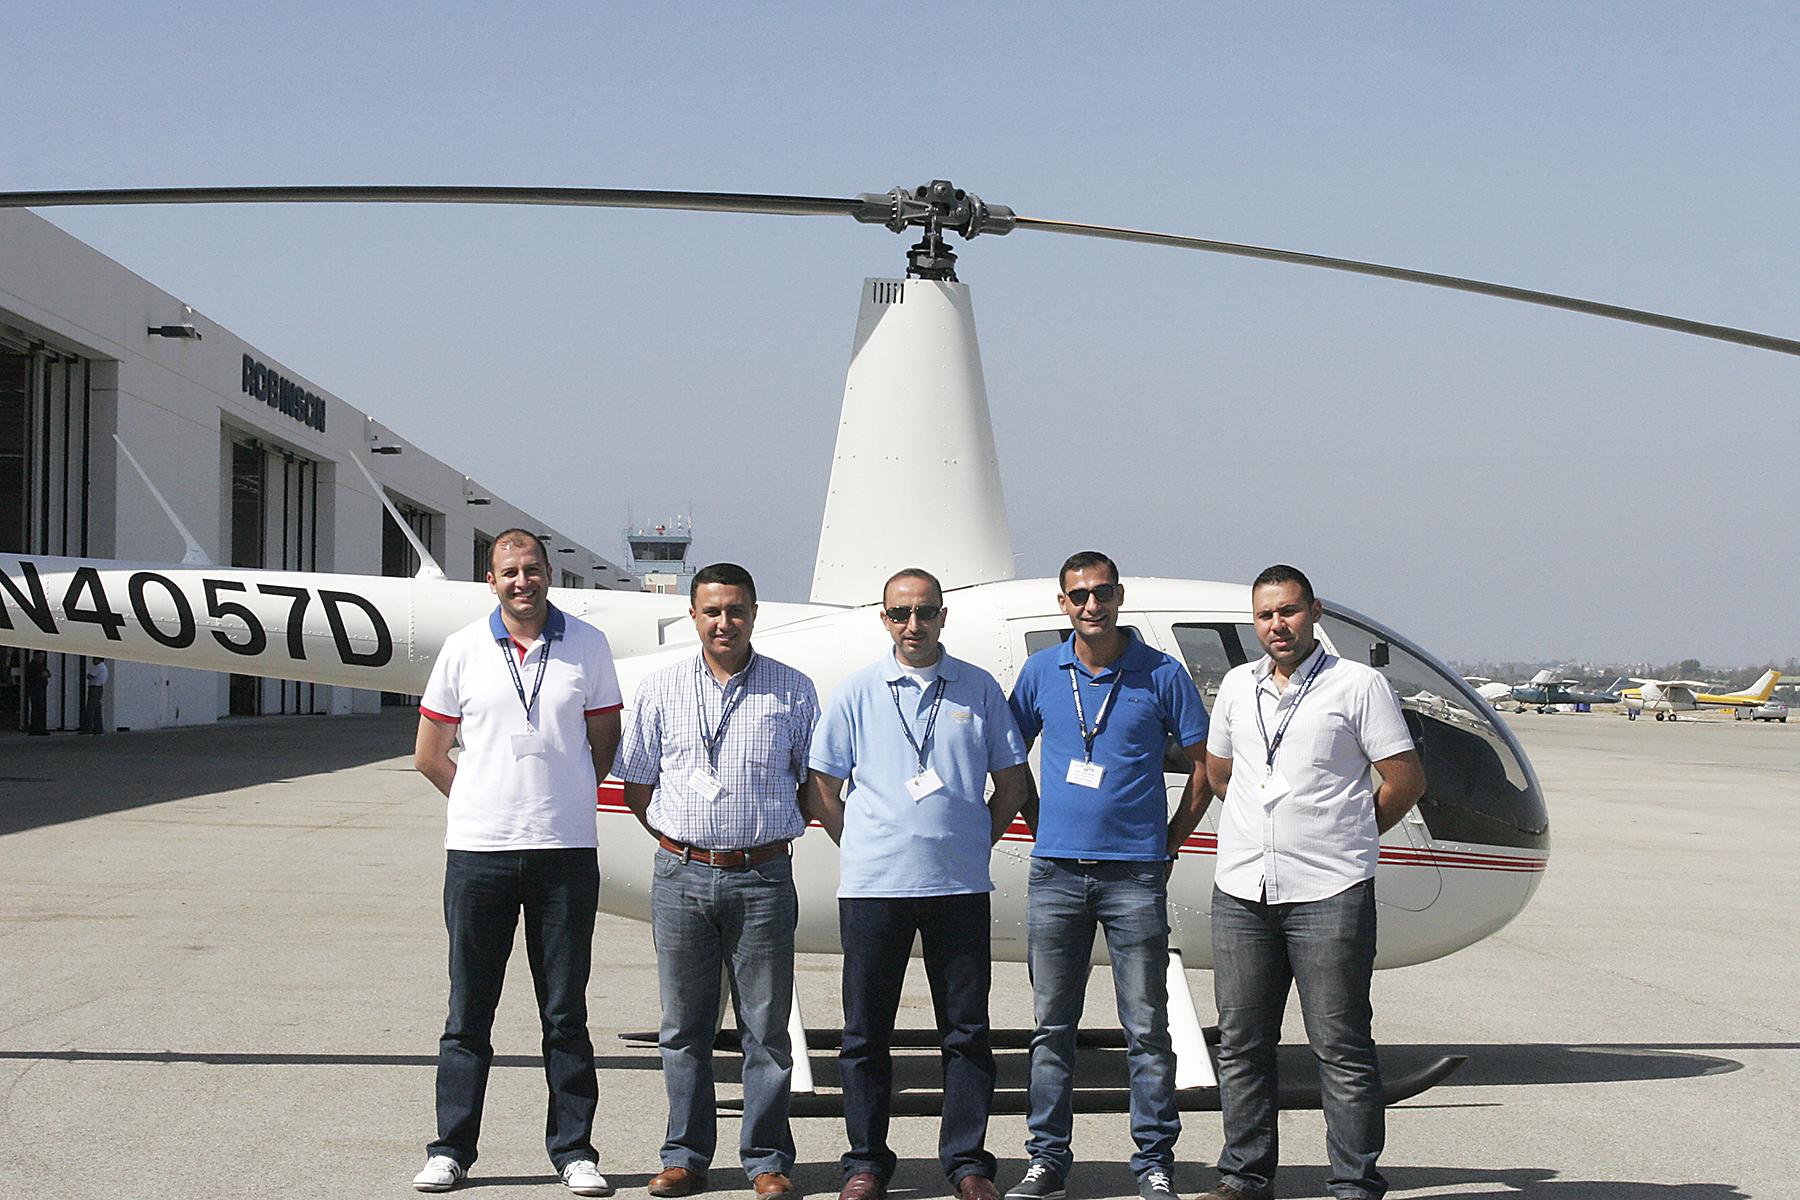 RJAF Pilots Group 1